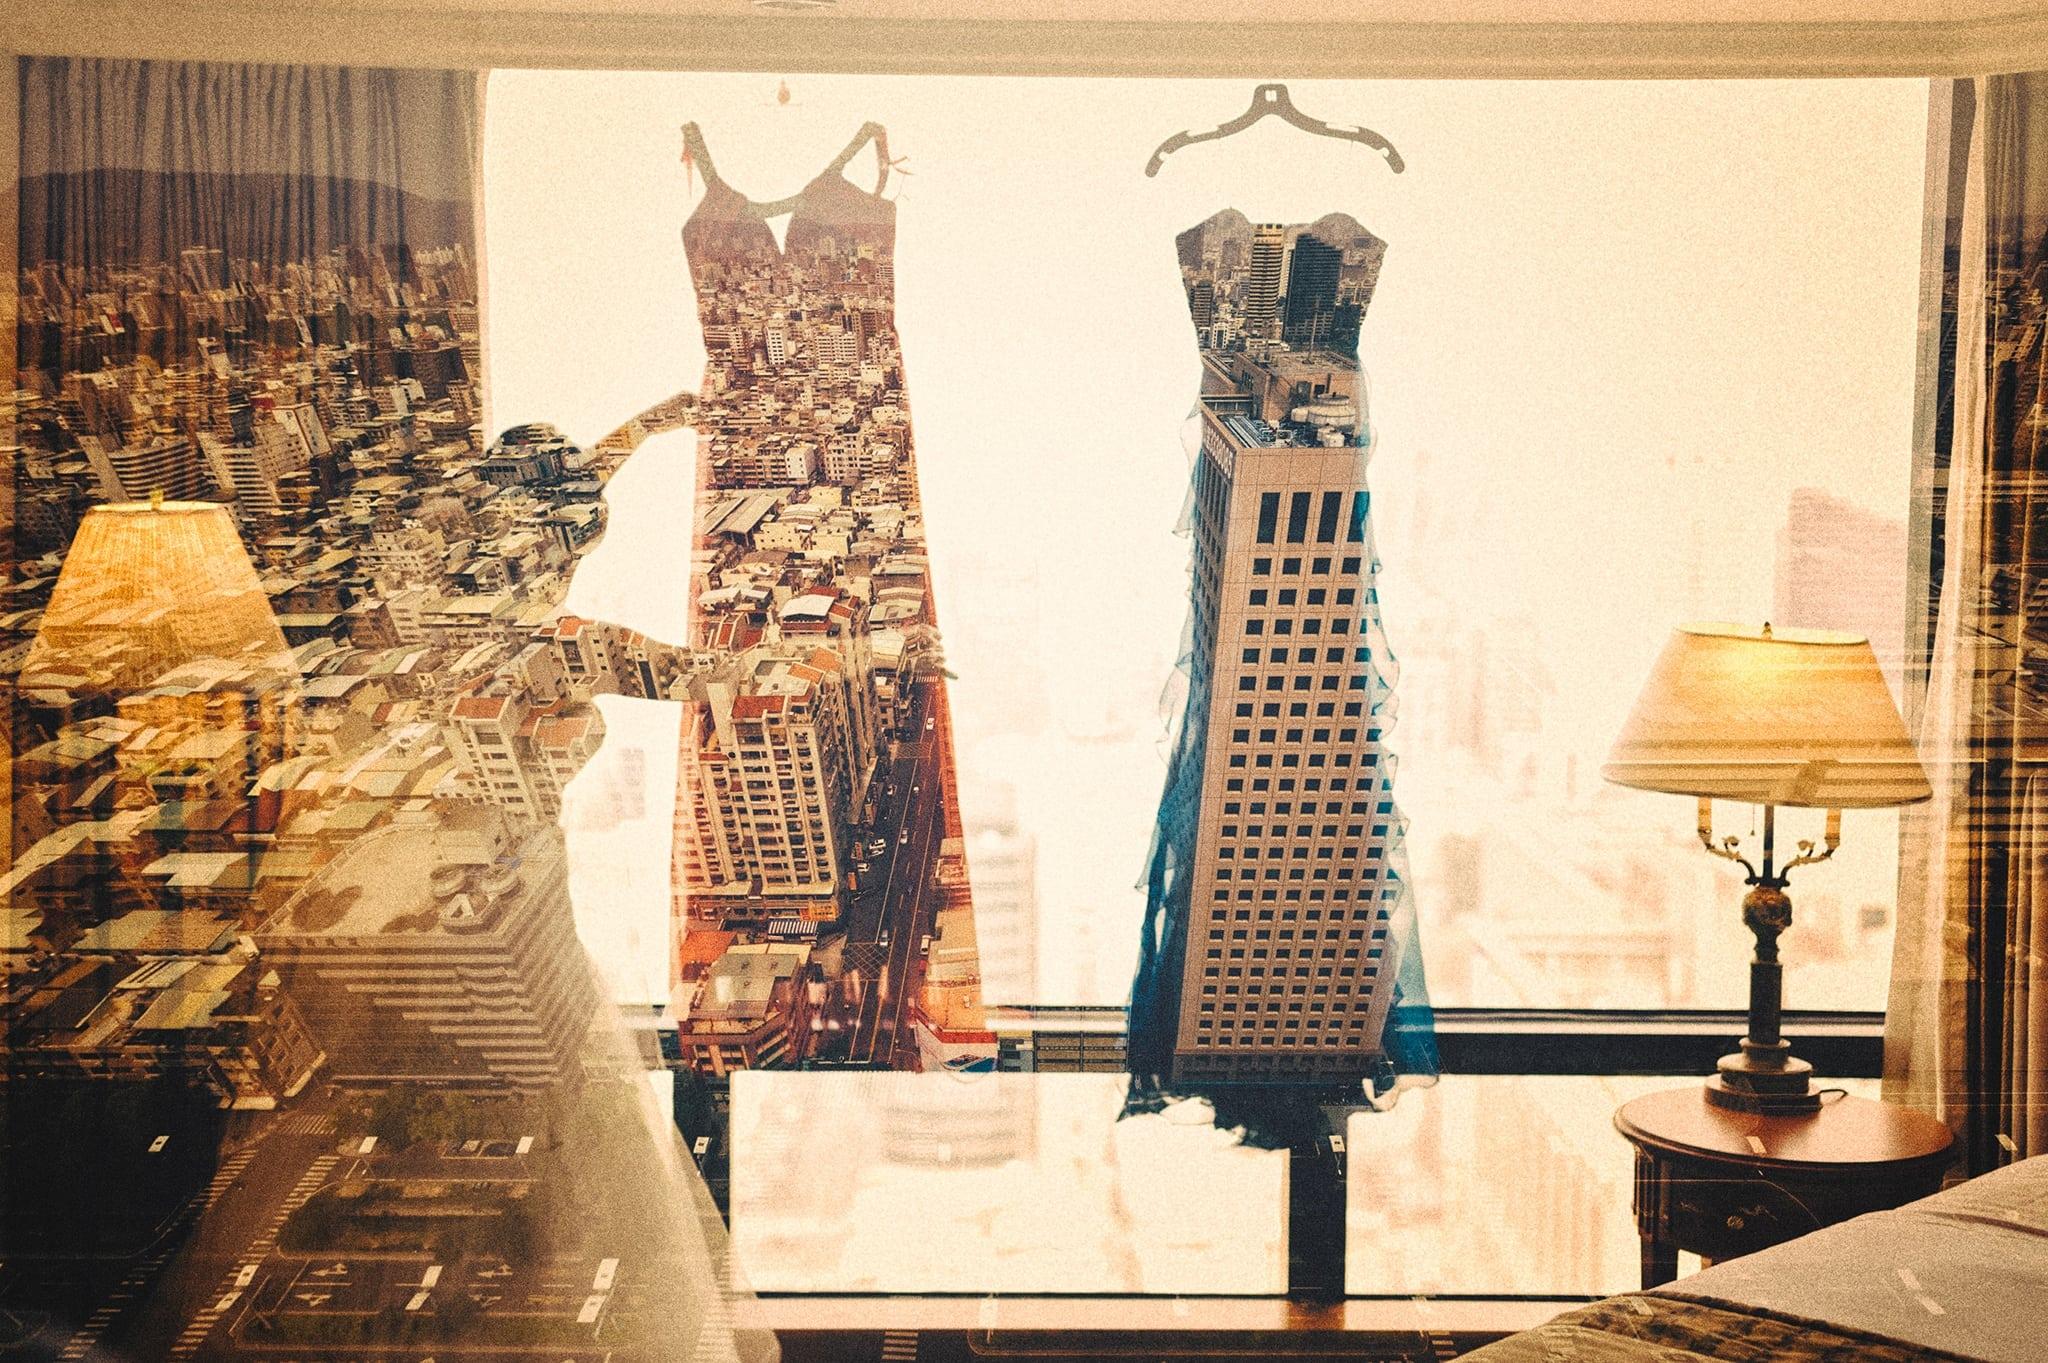 獲獎 2014 ISPWP「The Wedding Dress 」類別